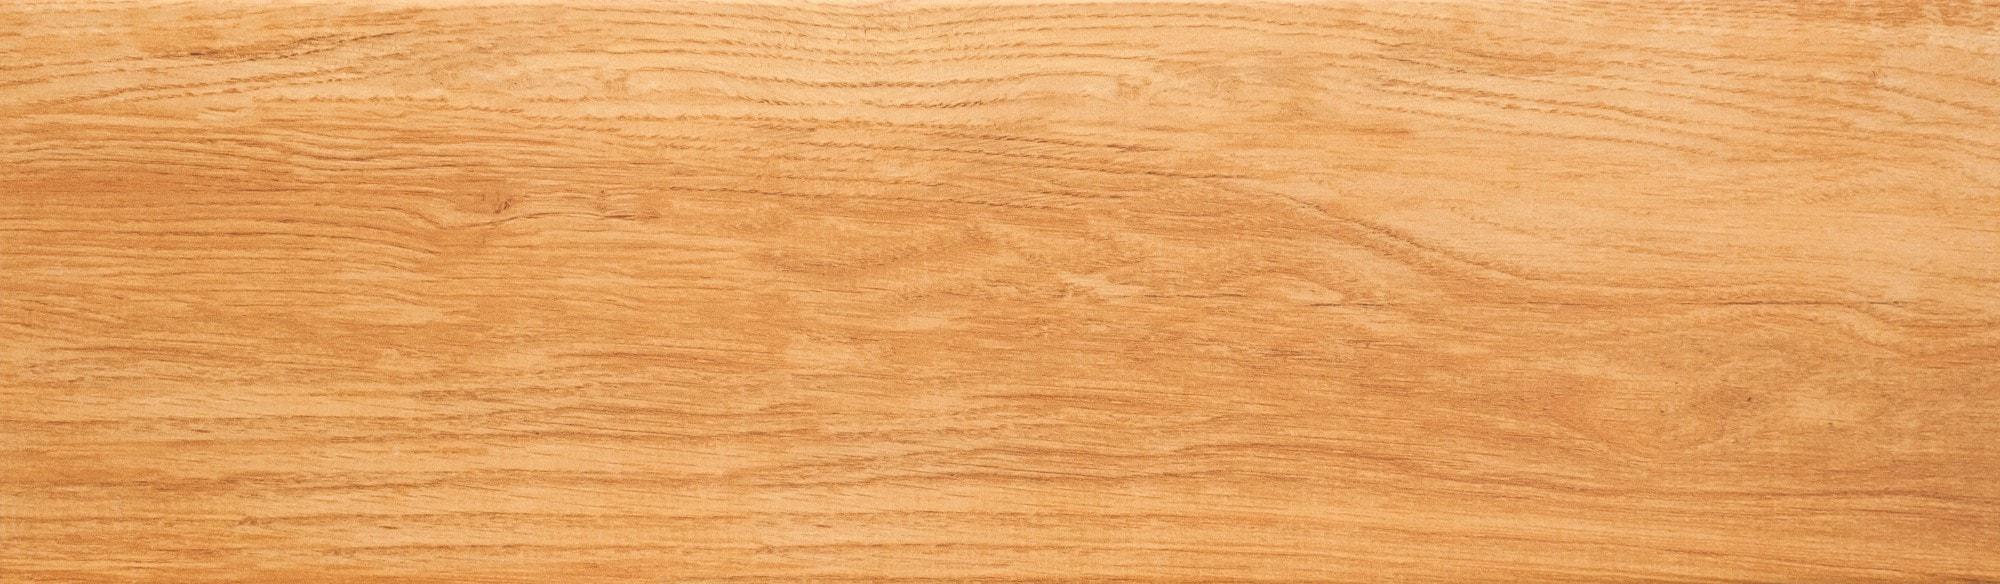 Płytka podłogowa Cerrad Mustiq Honey 600x175x8mm 14314